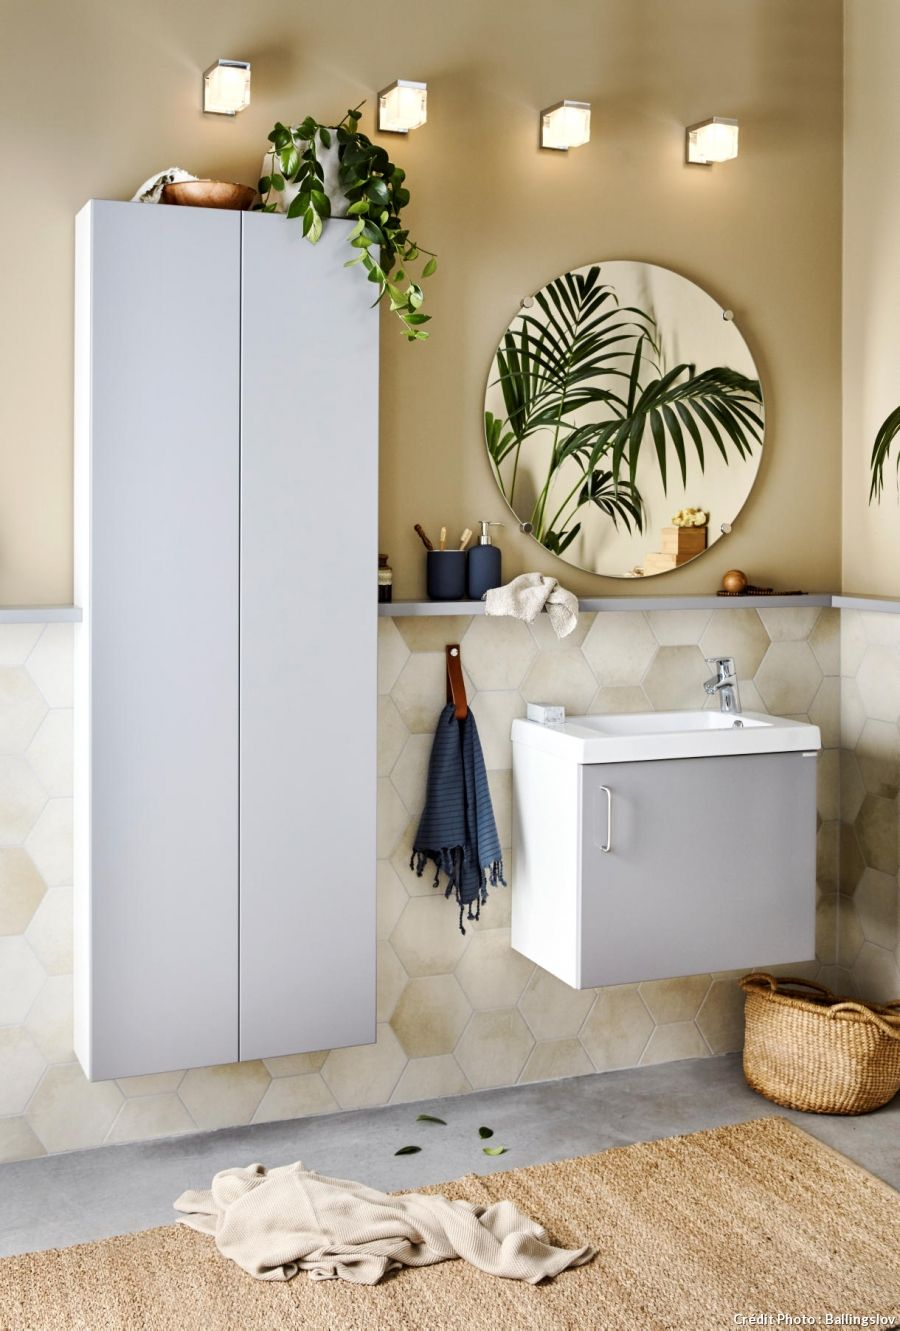 Salle de bains zen : quelle ambiance adopter ?  Salle de bain zen